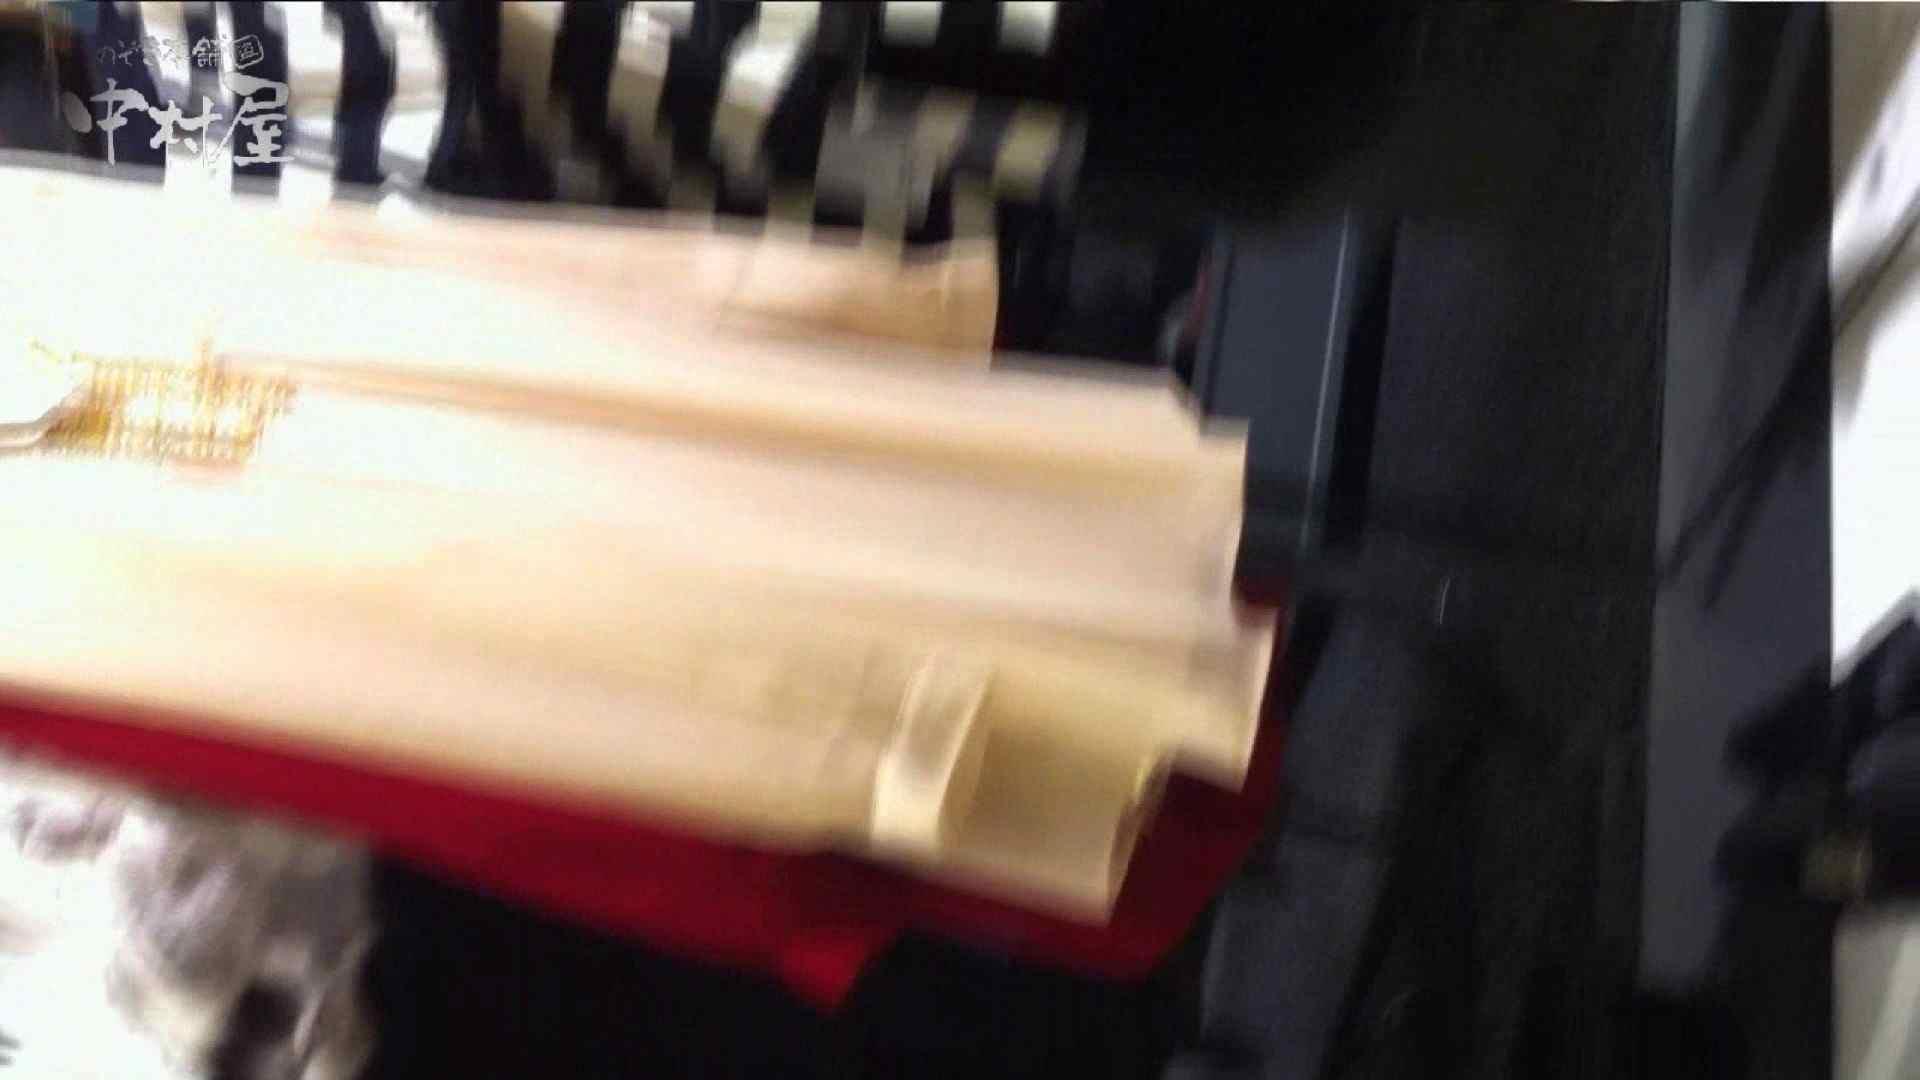 vol.83 美人アパレル胸チラ&パンチラ 赤Tバック店員さんいらっしゃい チラ AV動画キャプチャ 62枚 23